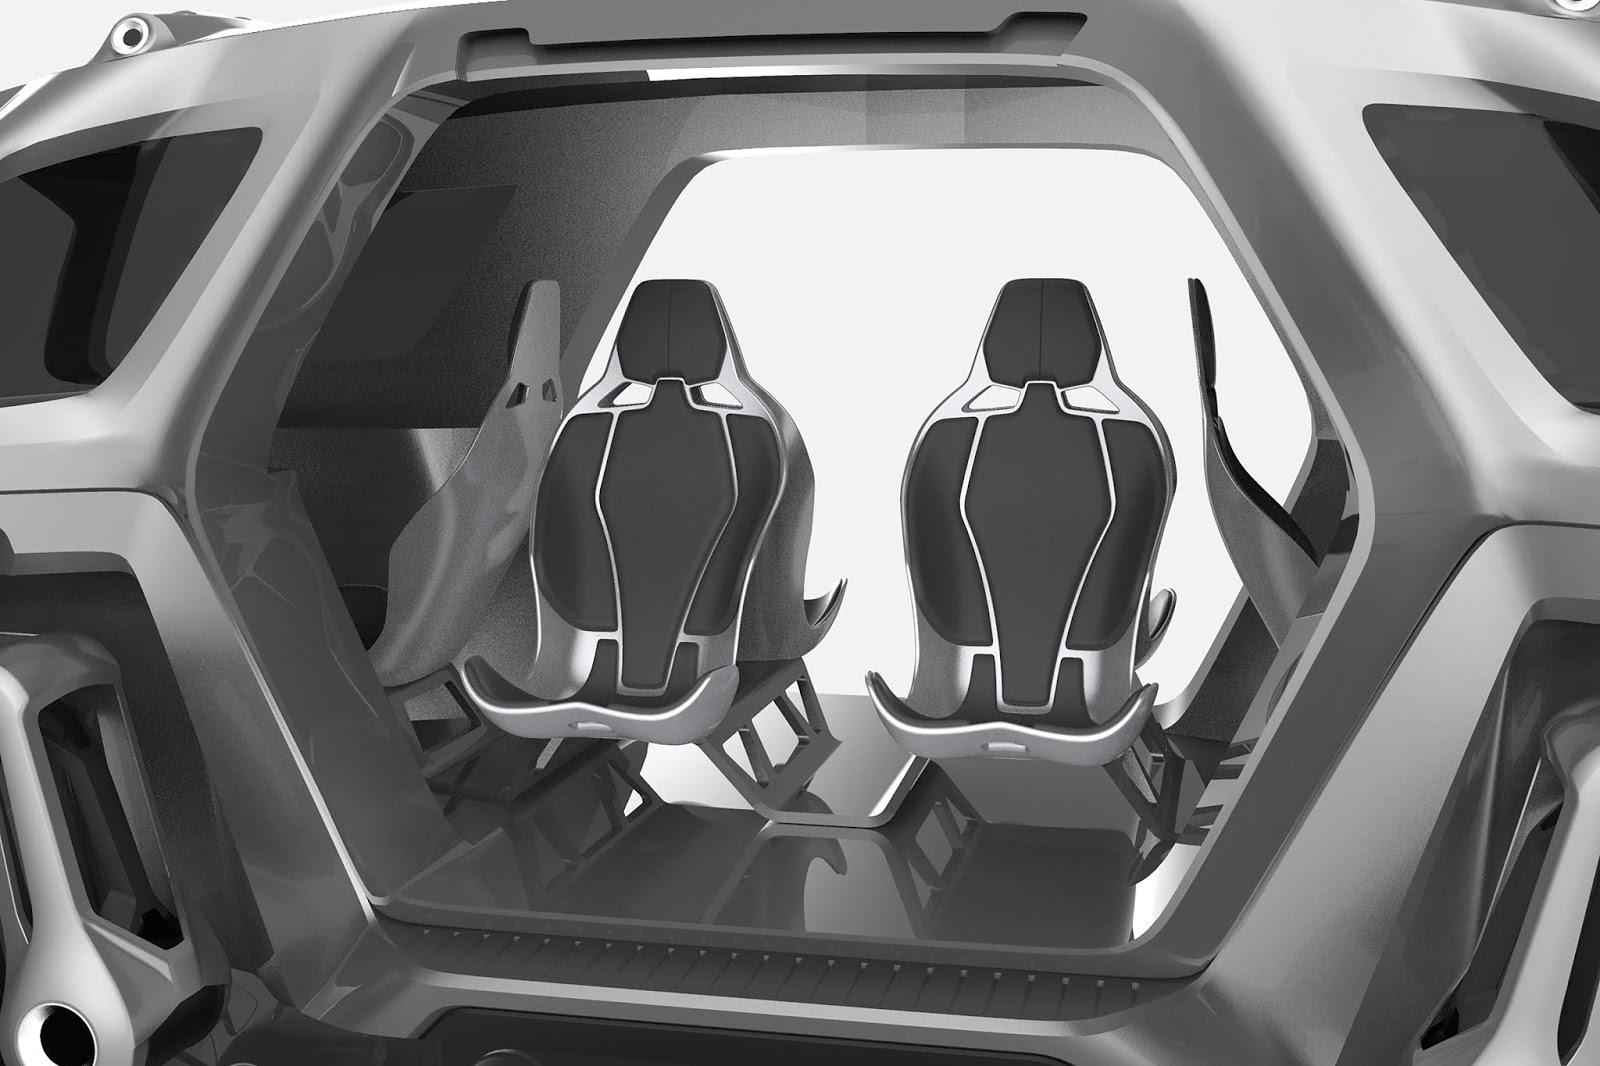 hyundai elevate concept252832529 H Hyundai έβγαλε όχημα με ρομποτικά πόδια! Electric cars, Hyundai, zblog, Τεχνολογία